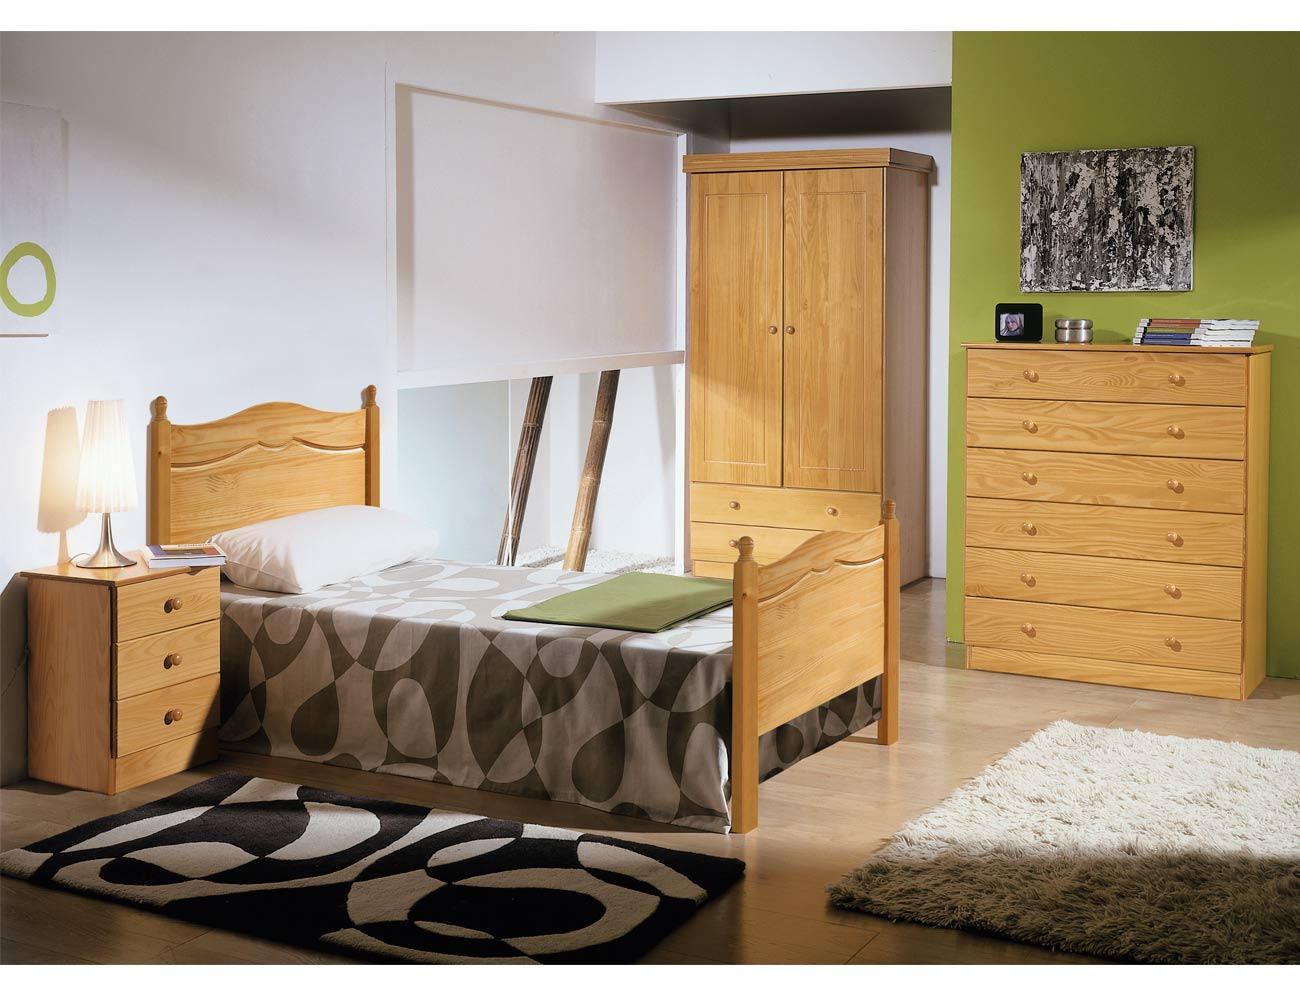 Dormitorio juvenil malaga madera pino provenzal2